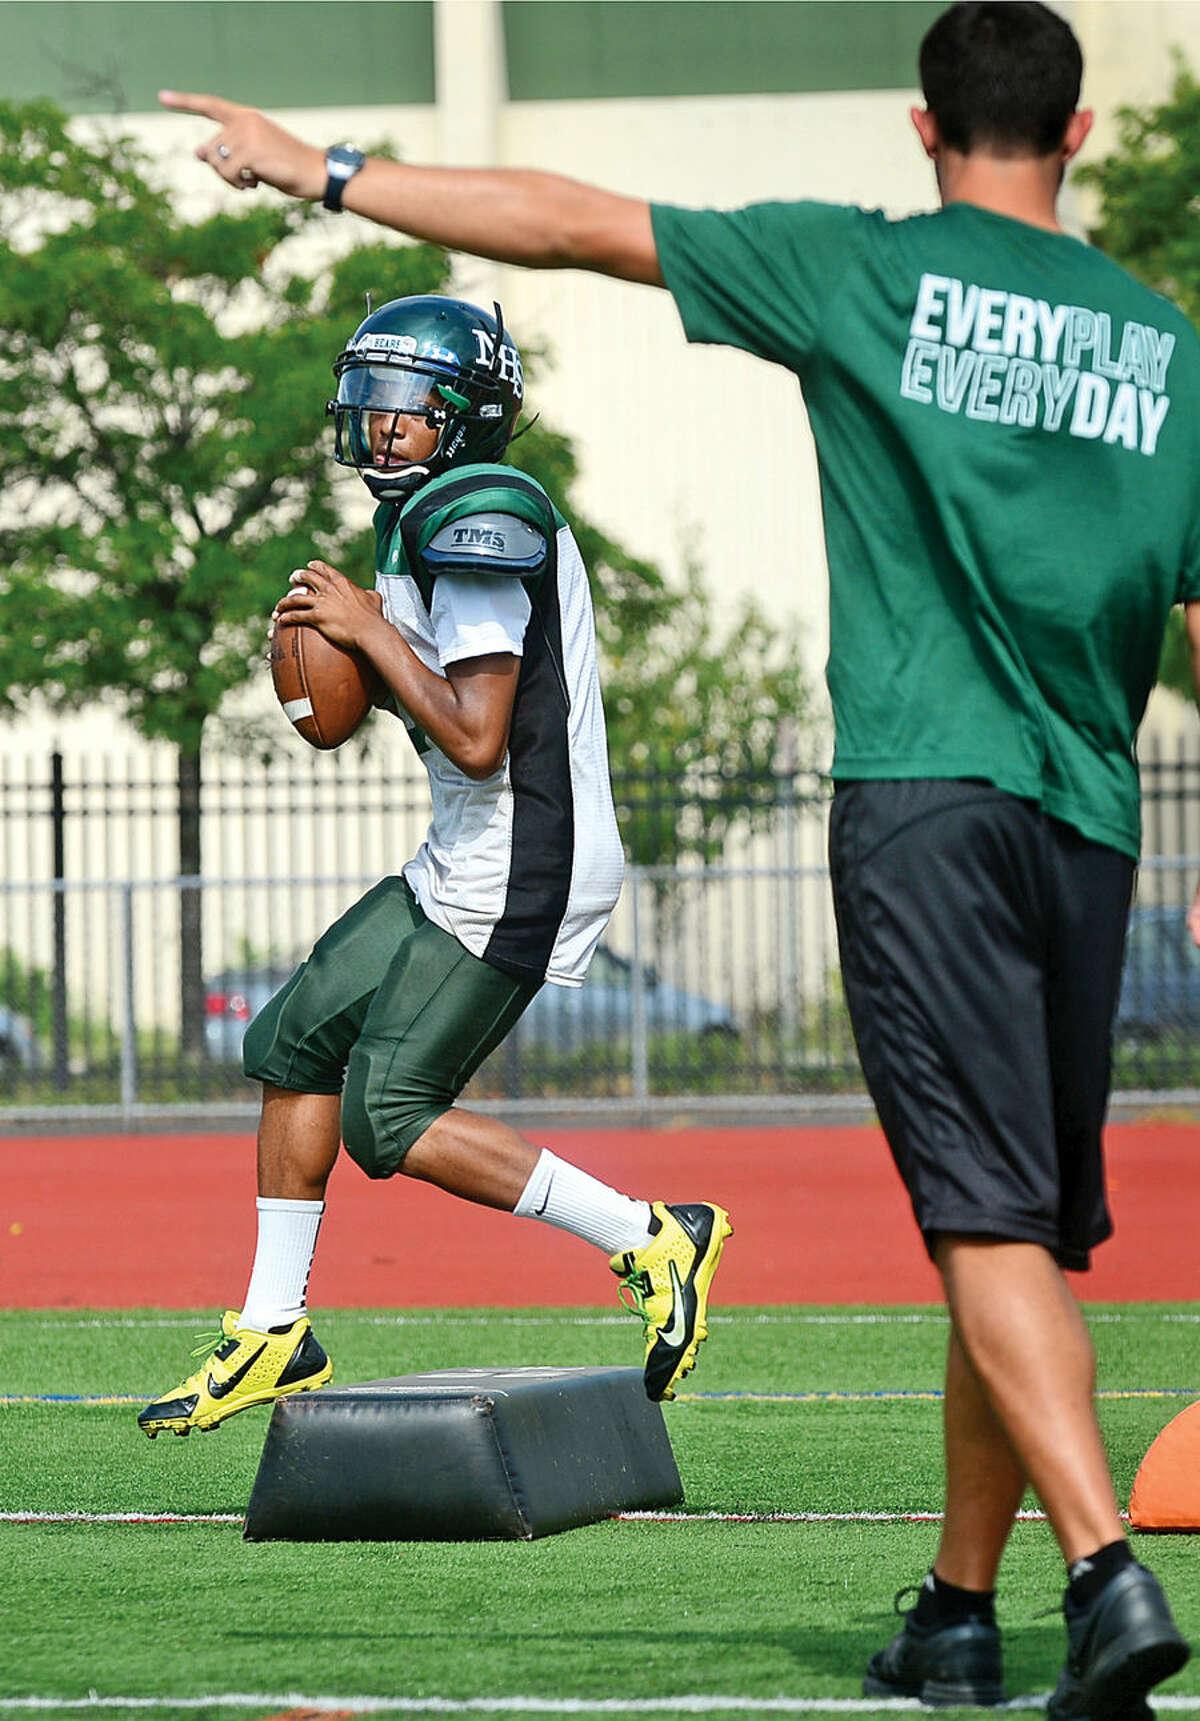 Hour photo / Erik Trautmann Norwalk High School quarterback Jeremy Linto practices Saturday at Testa Field.